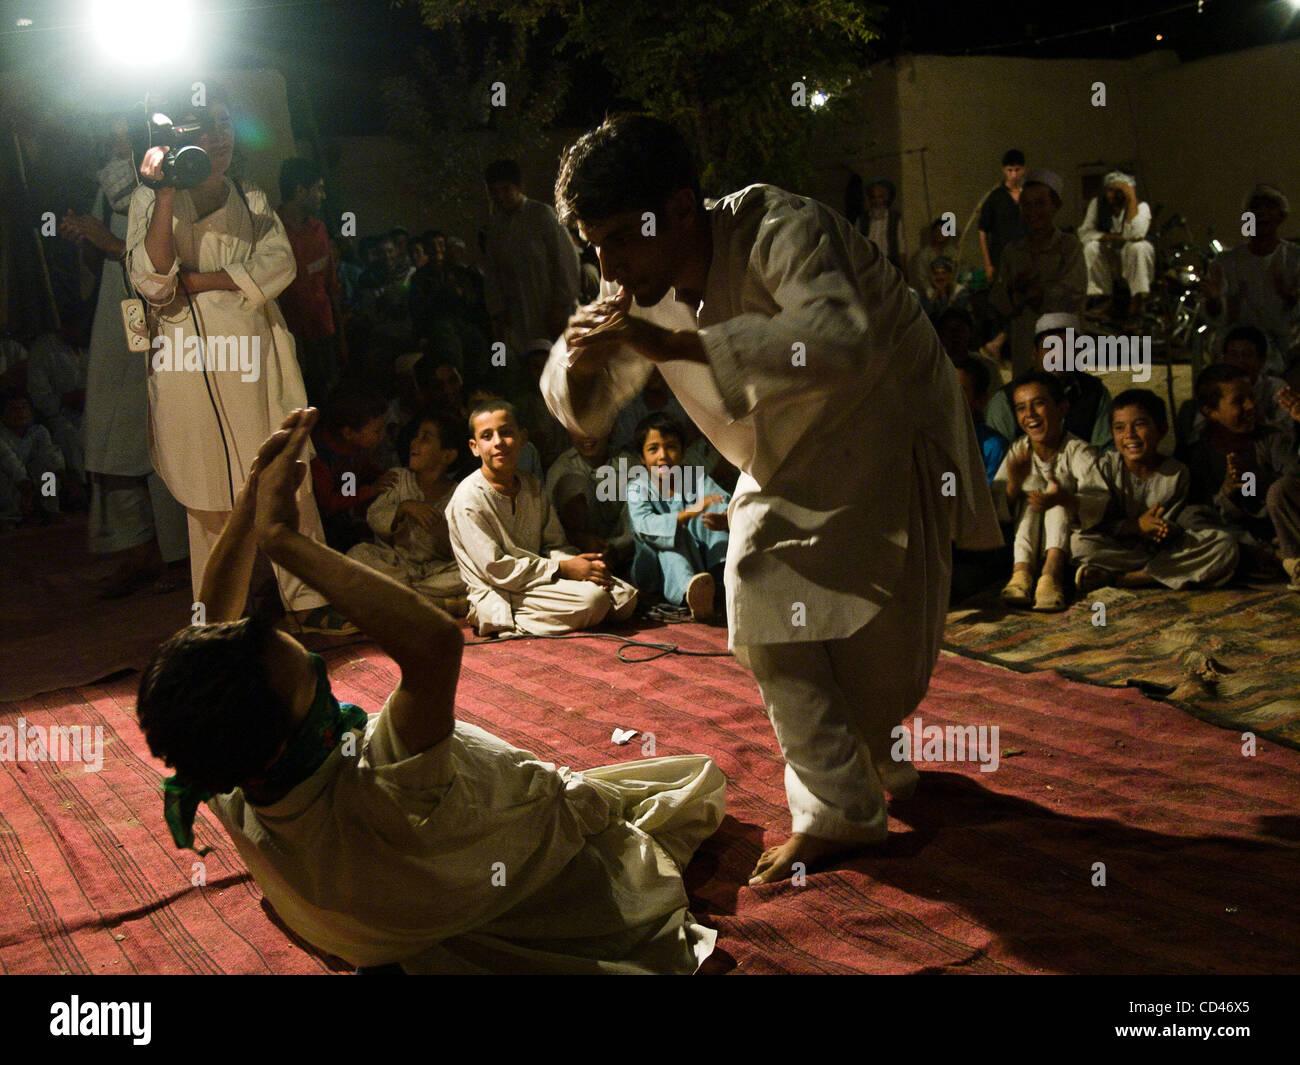 Money Dance Wedding.Money Dance Wedding Stock Photos Money Dance Wedding Stock